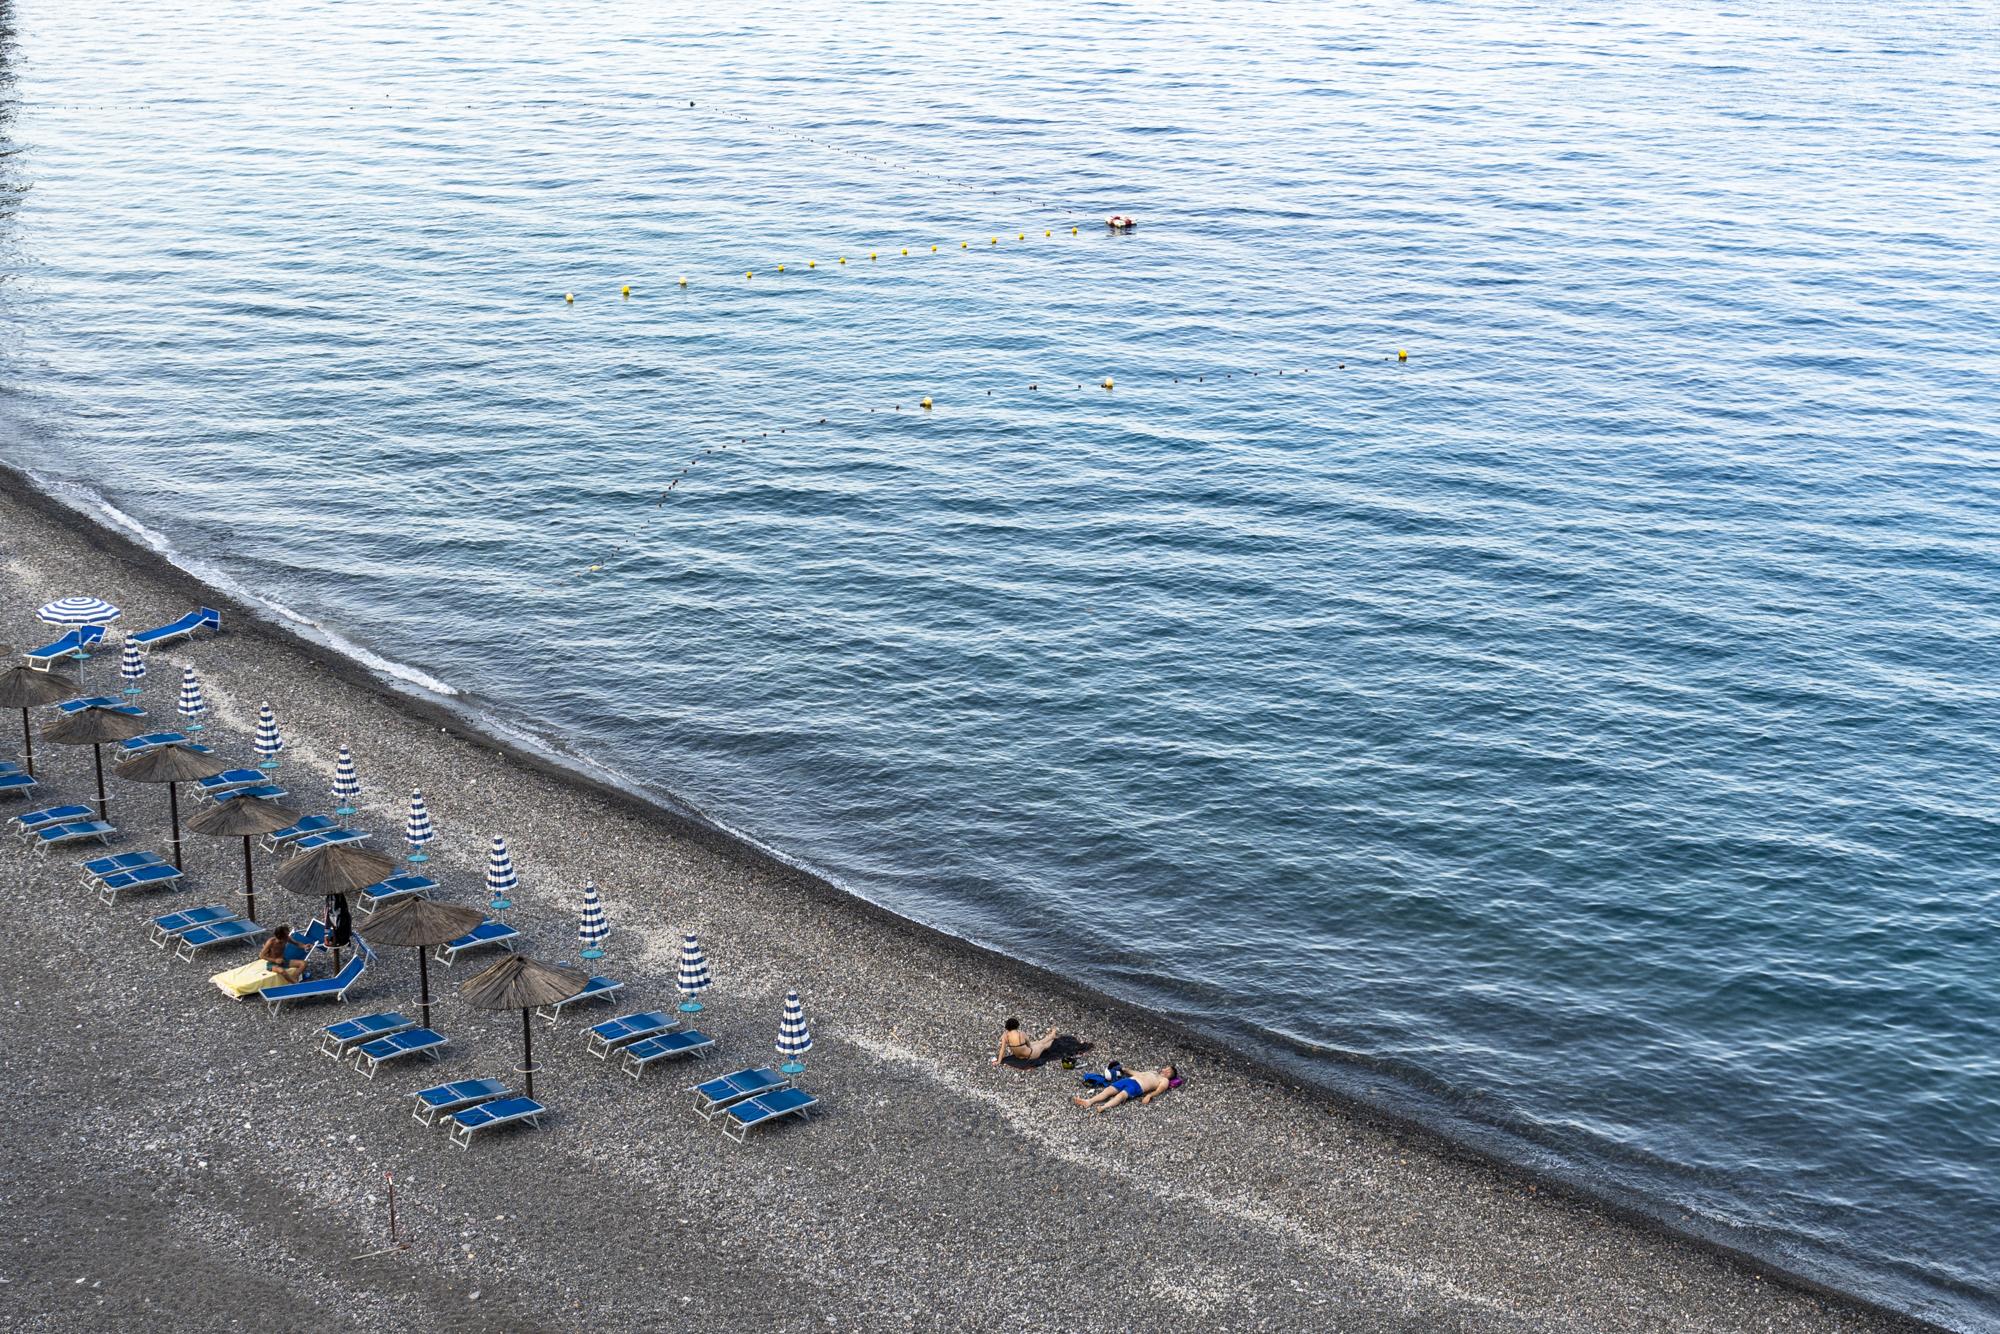 Spiagge Bianche (White Beach), Lido, Lipari